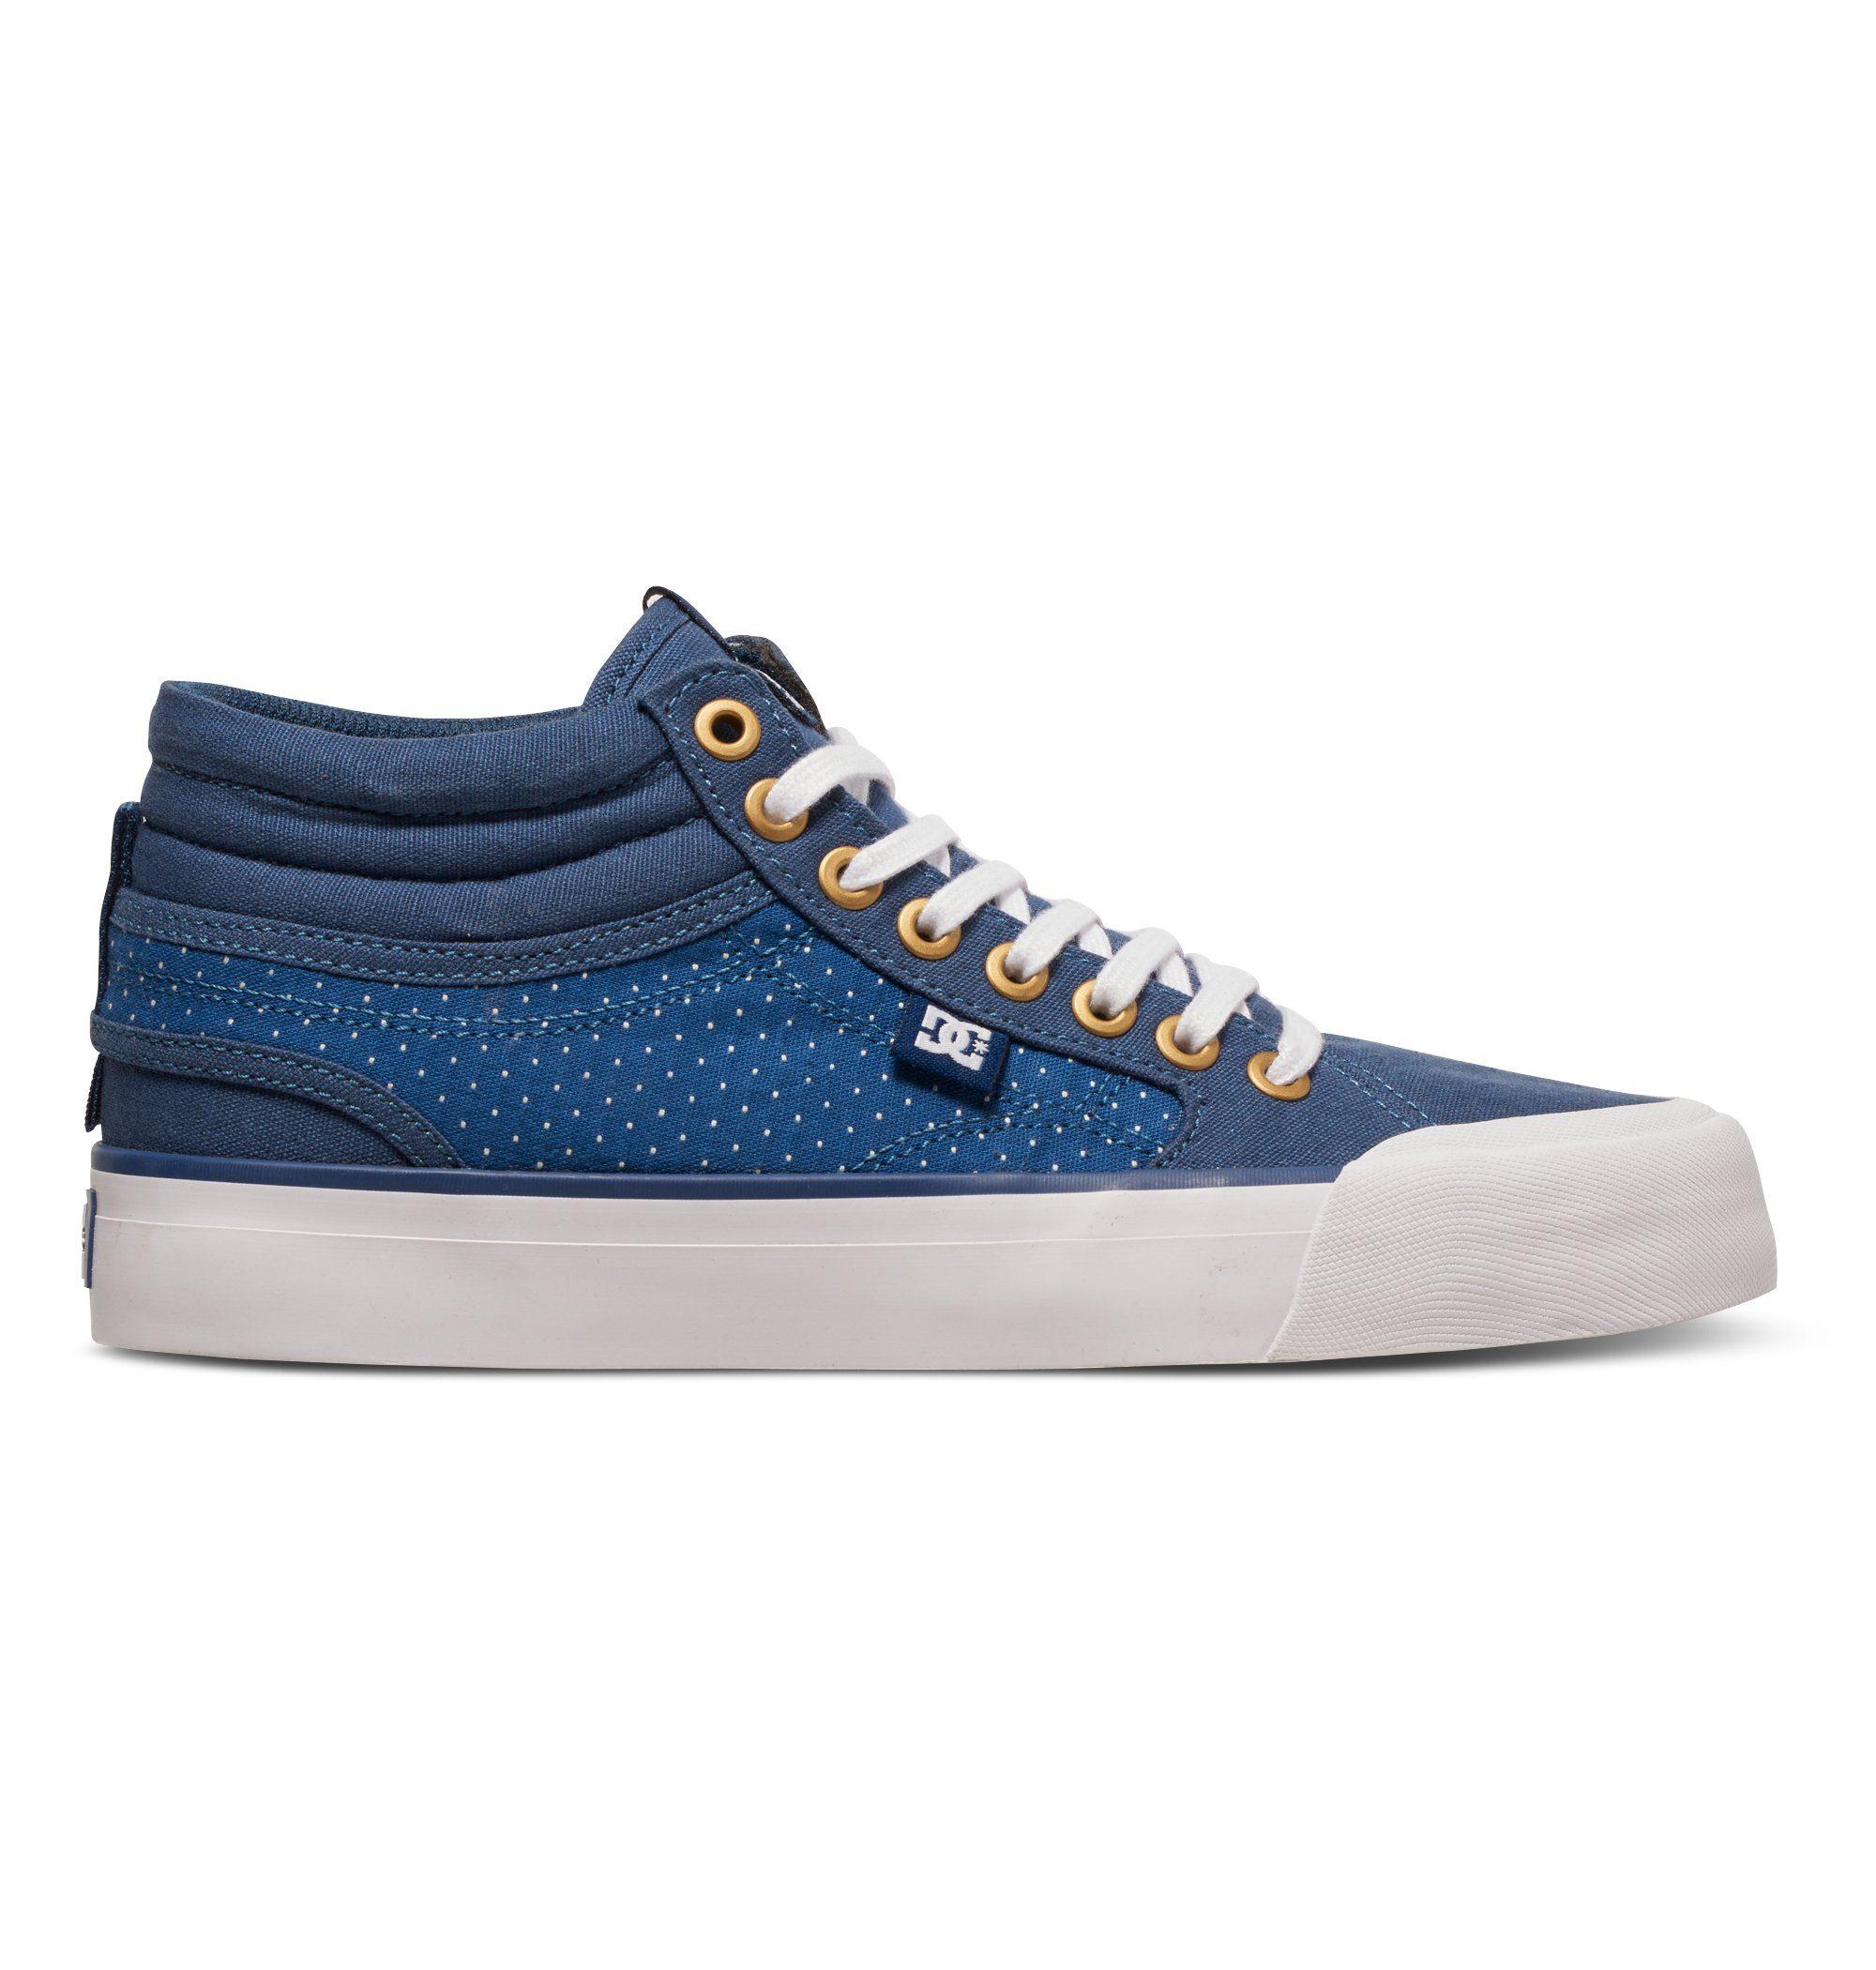 DC Shoes Hi top Evan Hi TX SE online kaufen  blue#ft5_slash#brown#ft5_slash#white